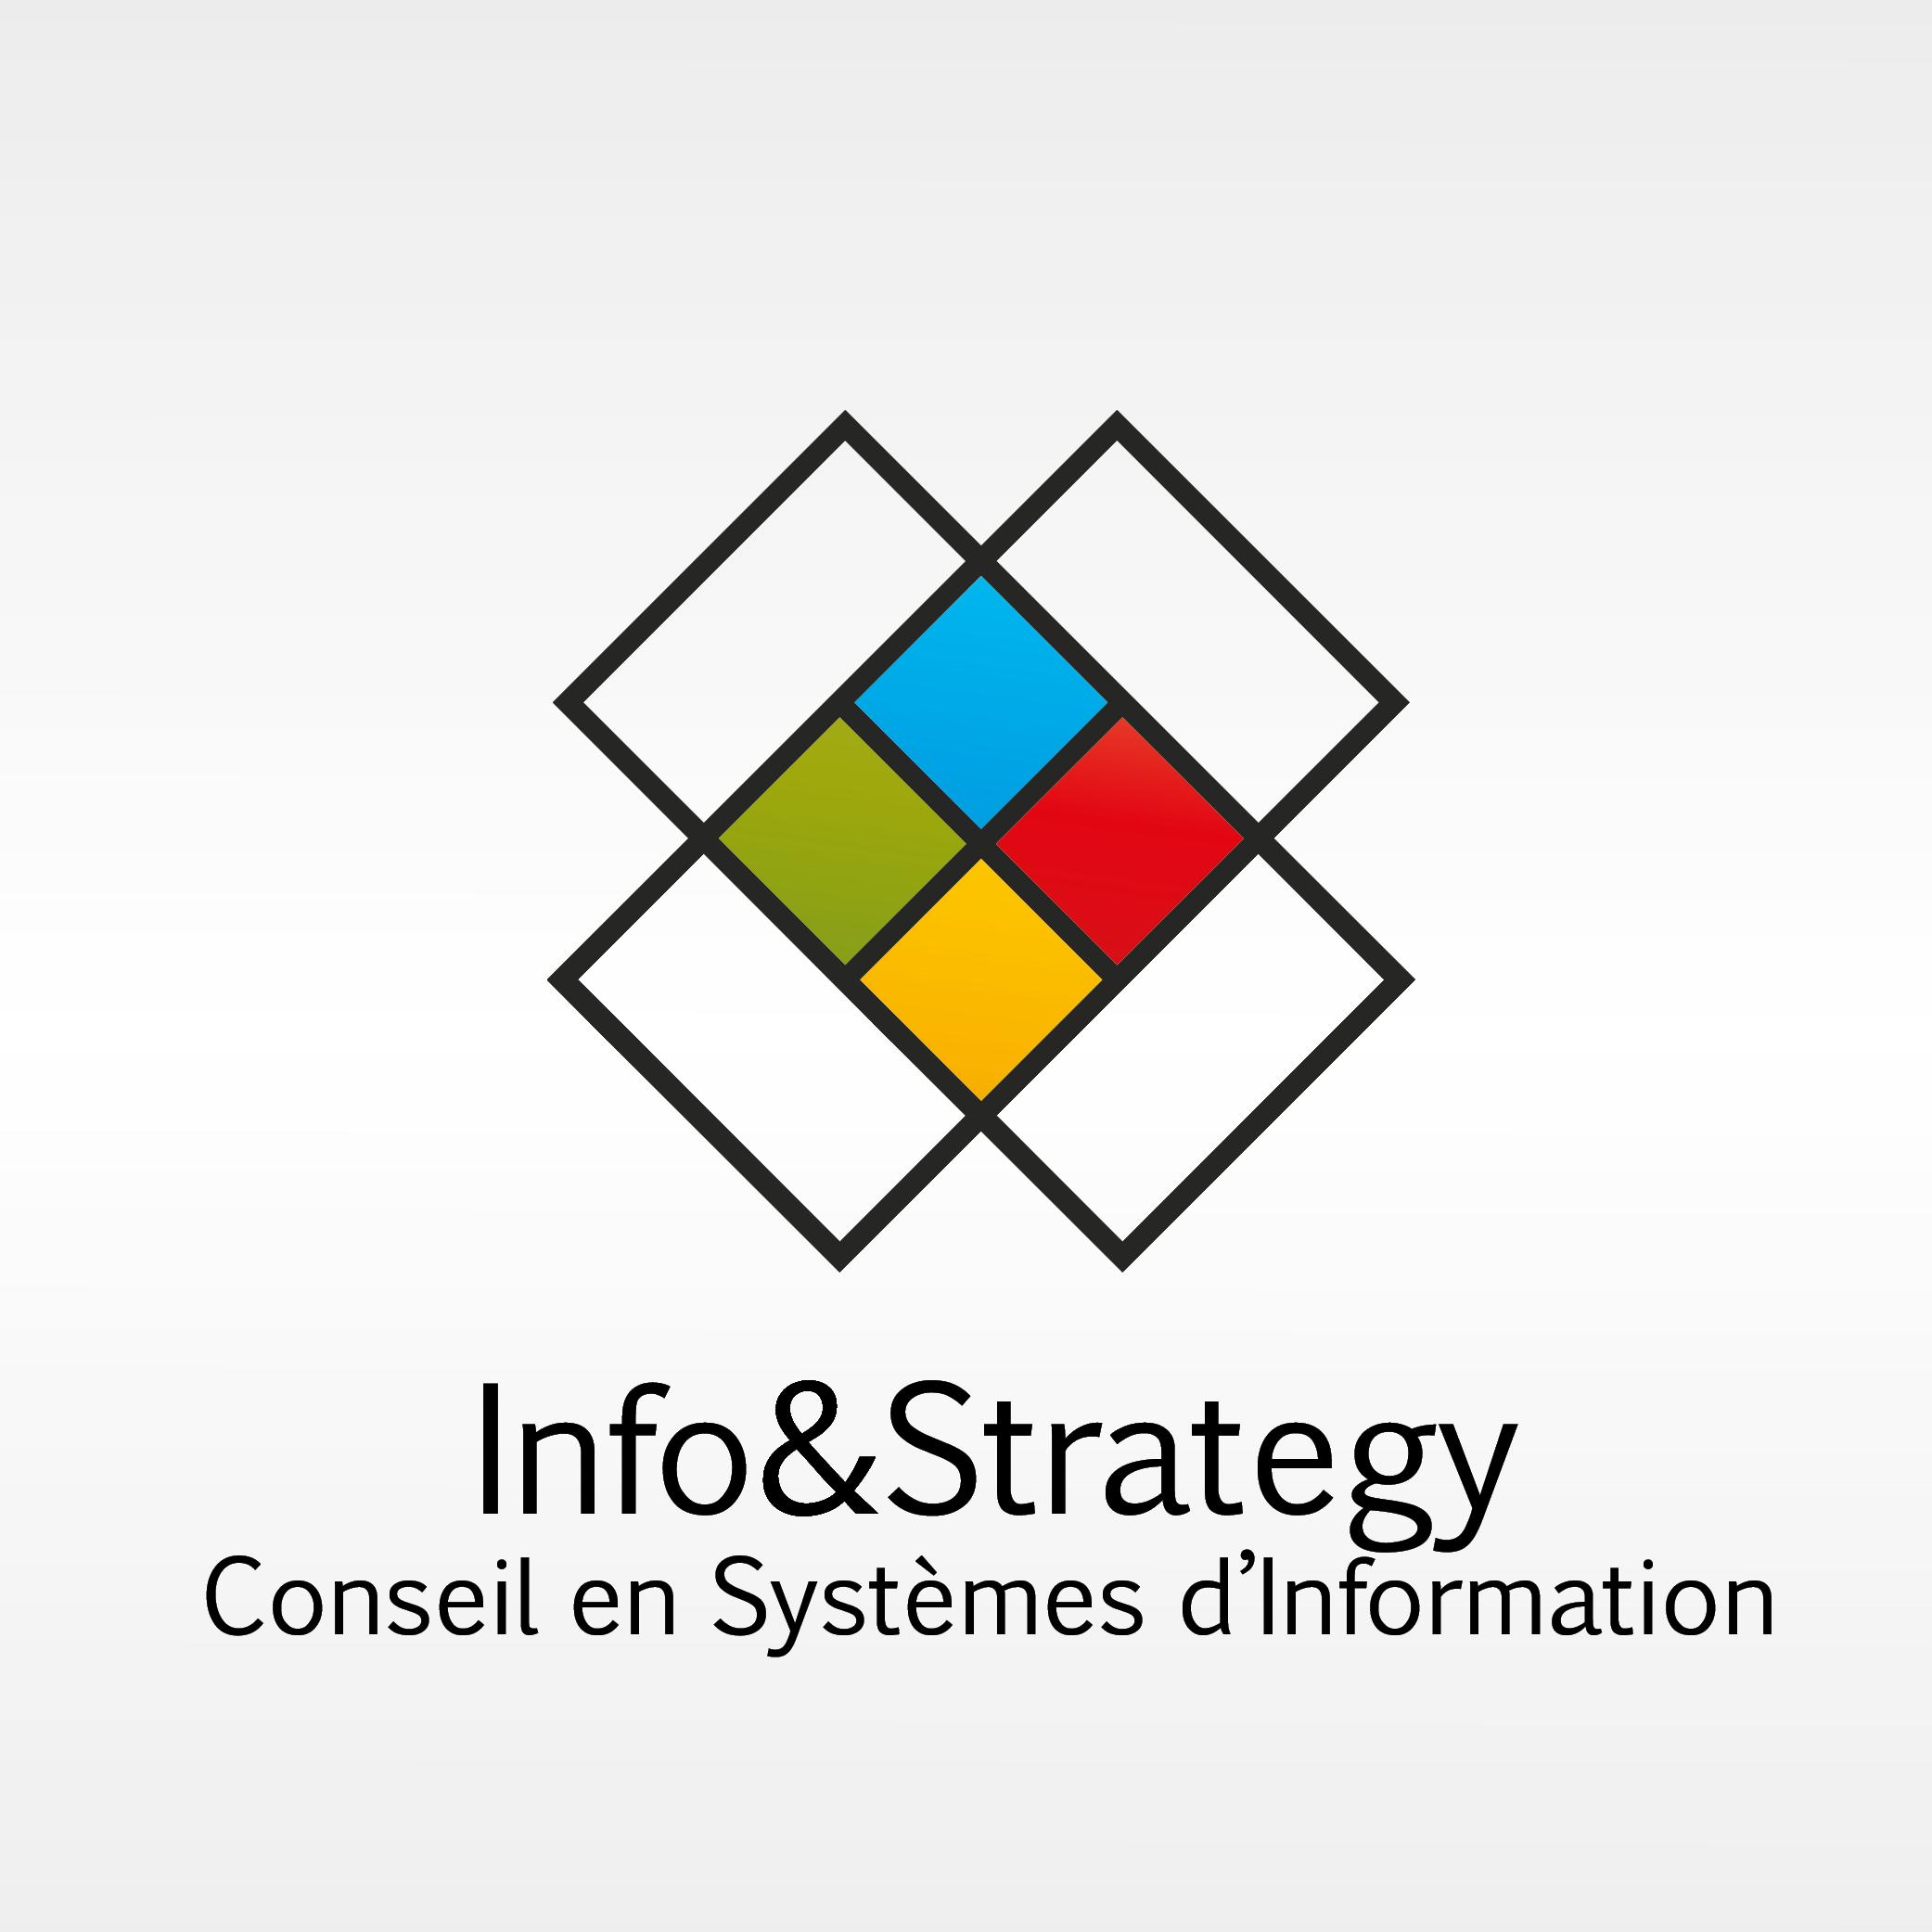 Info & Strategy : Conseil en Systèmes d'Information